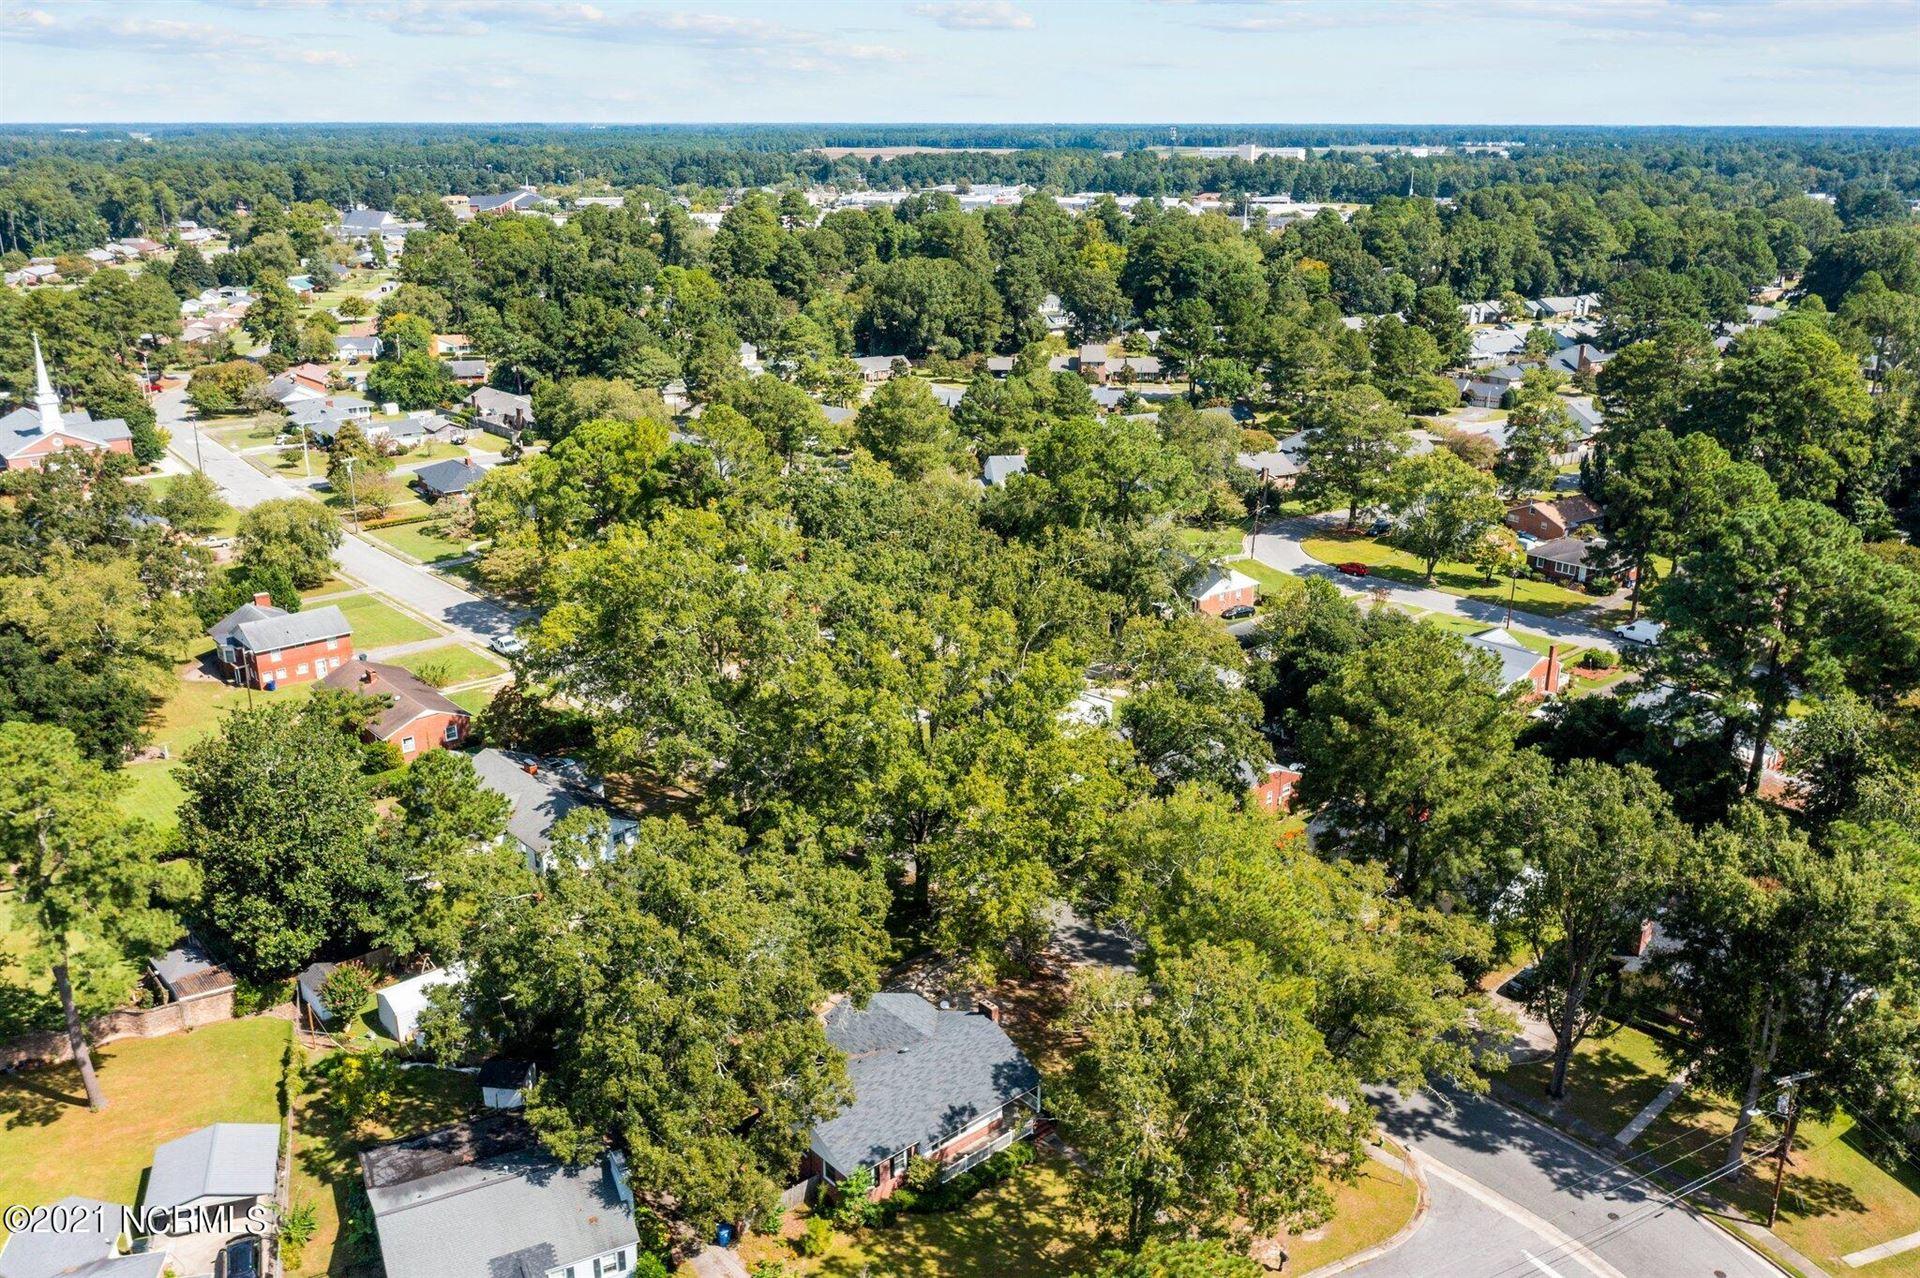 Photo of 1001 Clifton Terrace, Kinston, NC 28501 (MLS # 100291930)